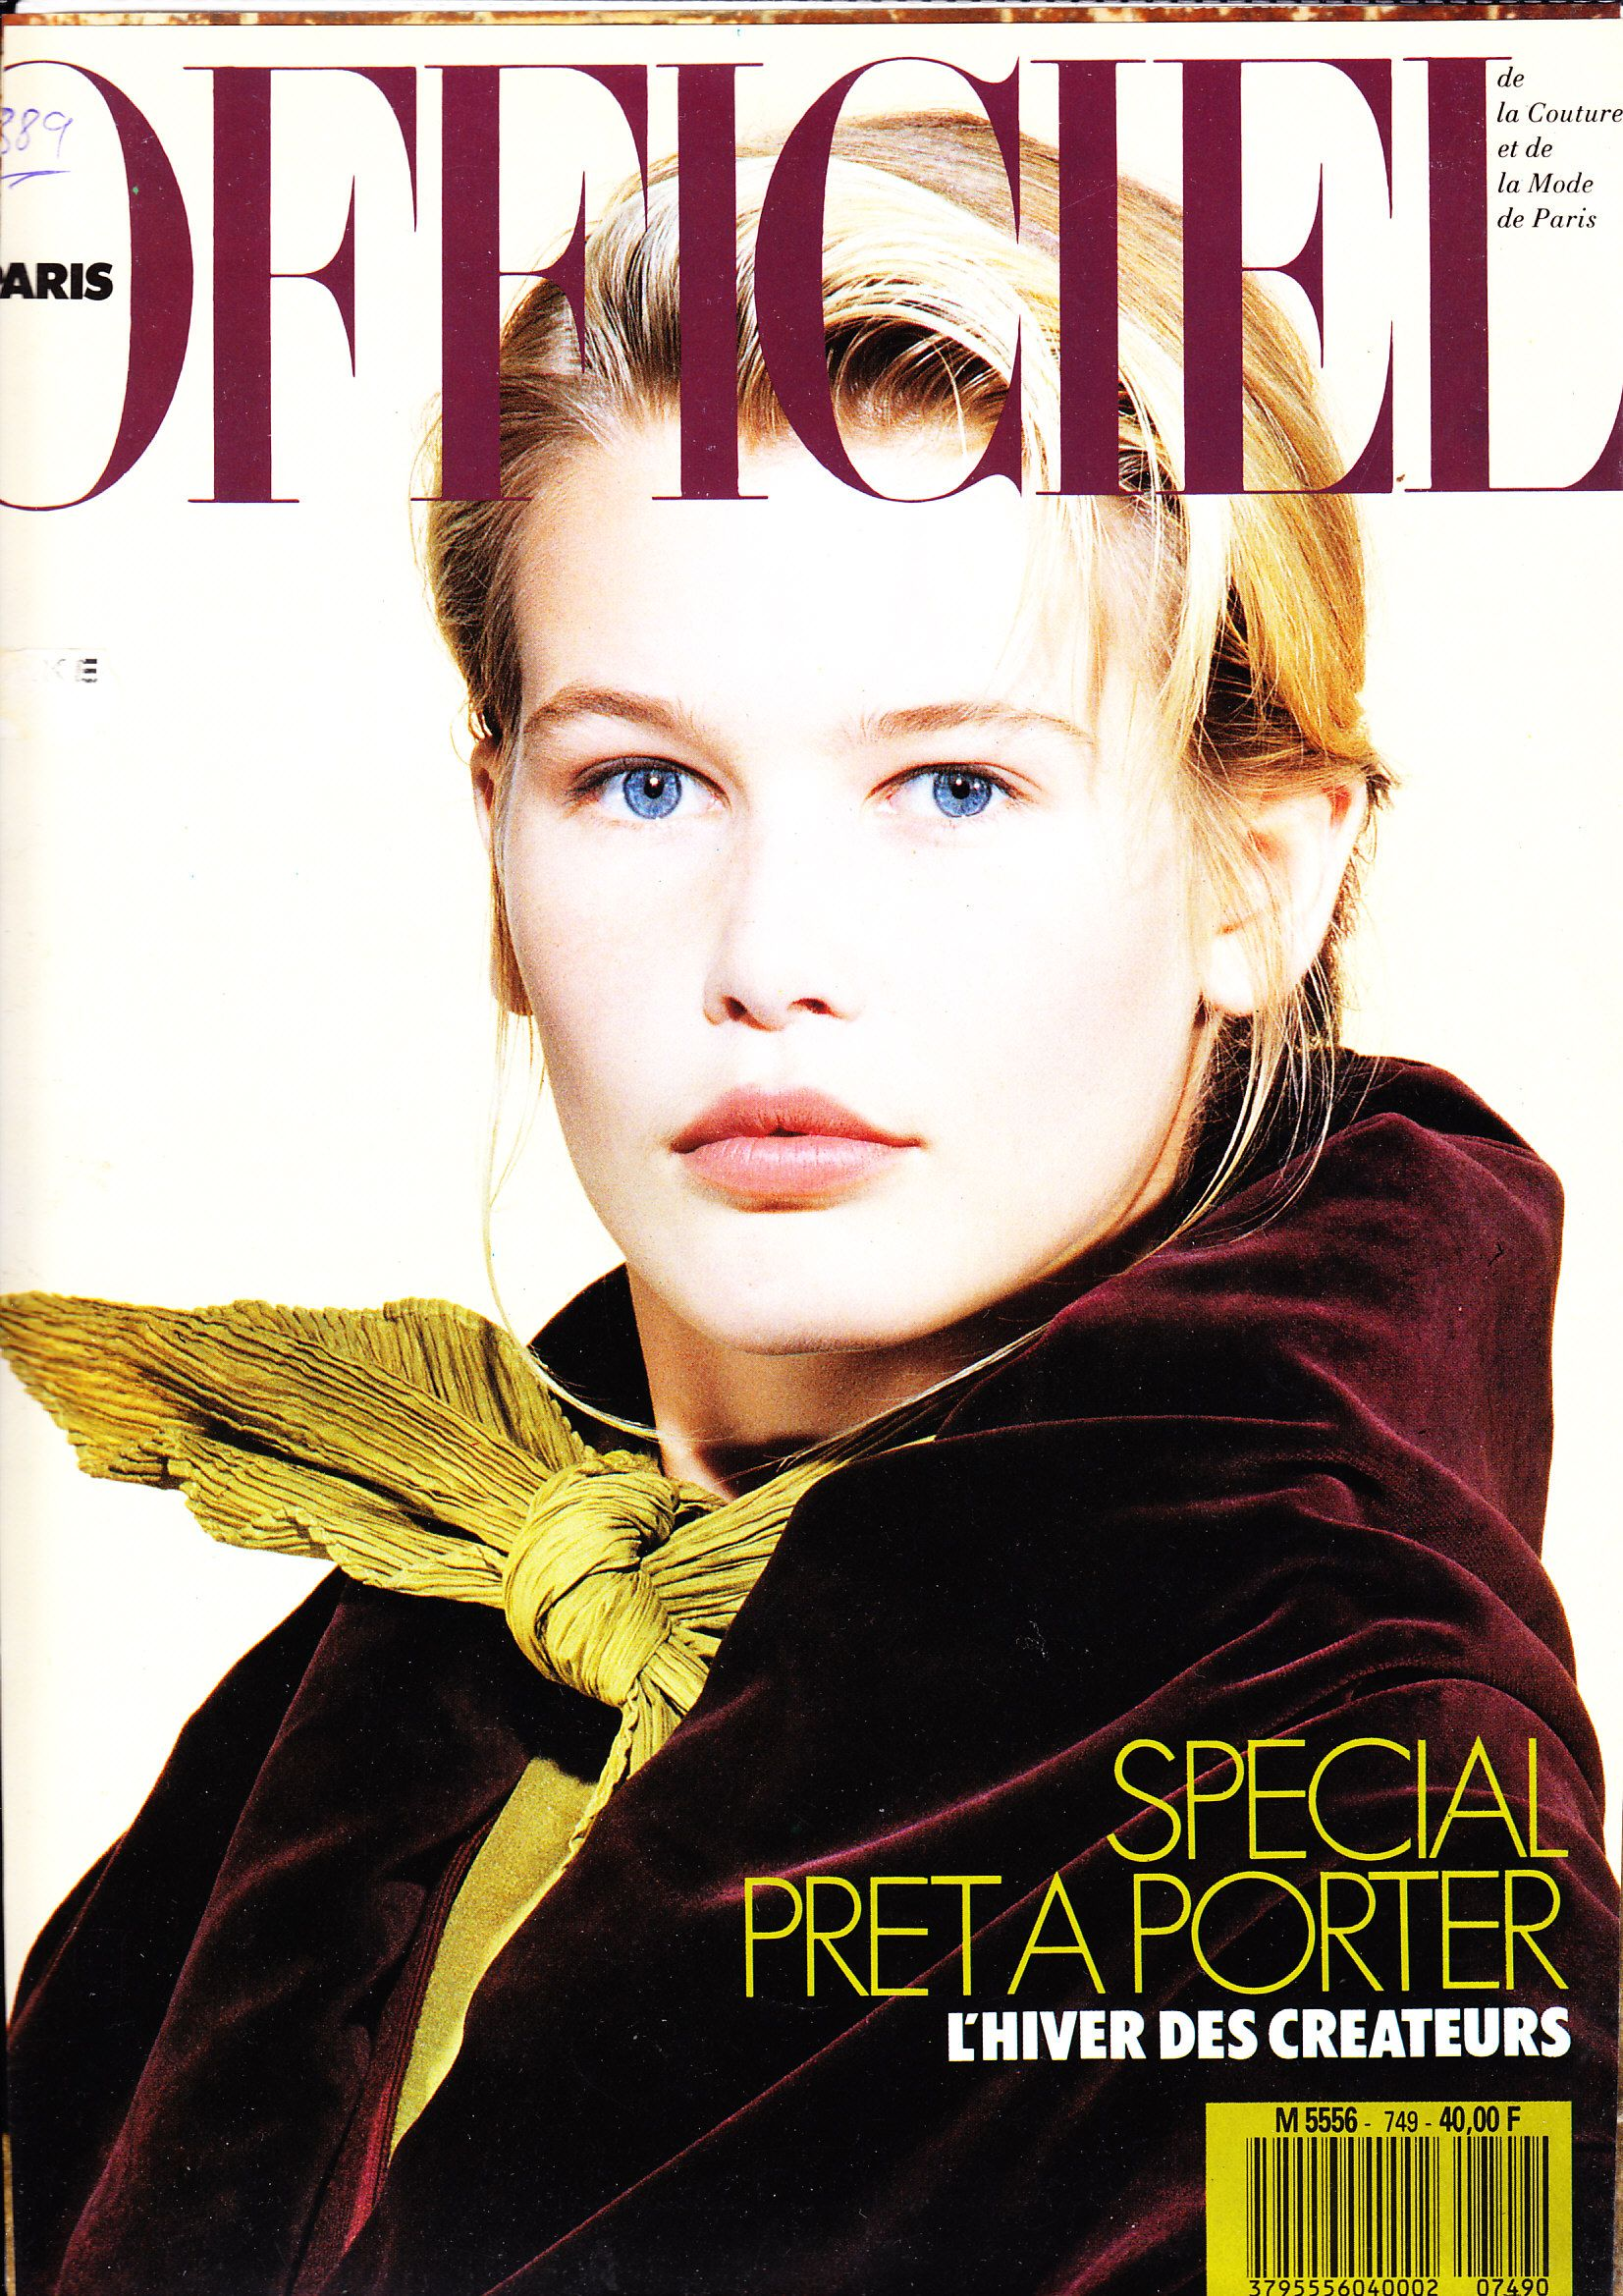 Claudia Schiffer Claudia Schiffer Magazine Cover Allure Magazine Cover